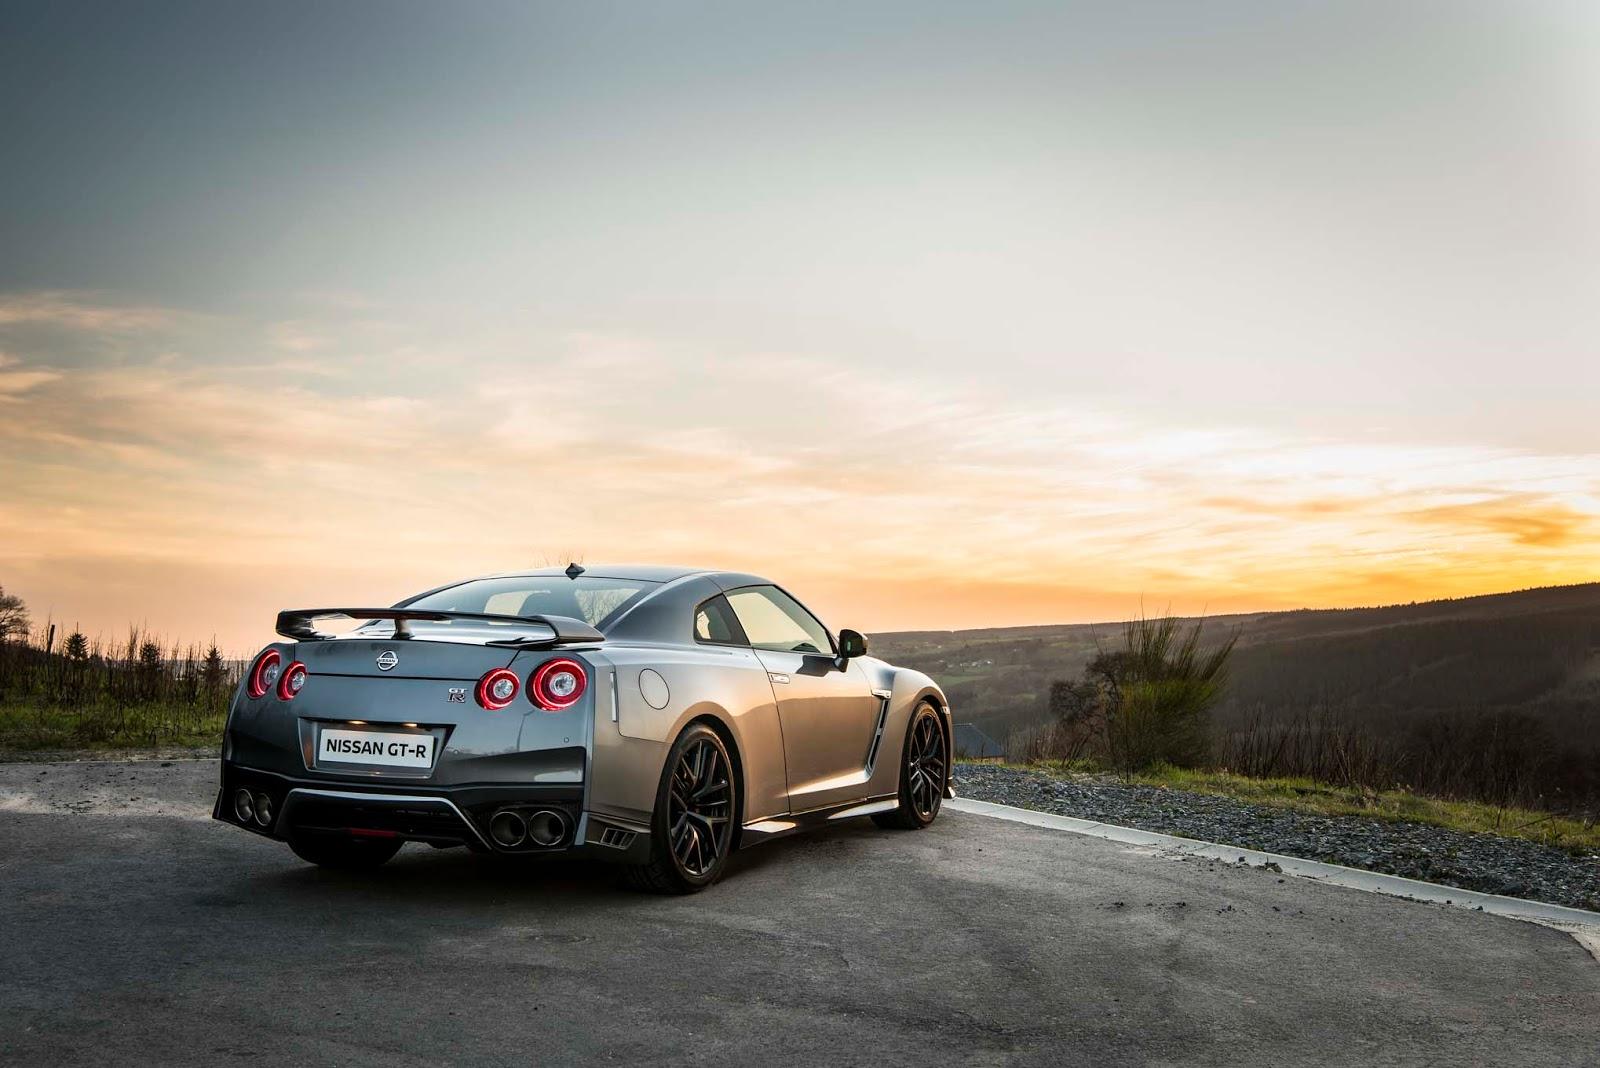 Top Car Nissan GTR 2017 Wallpaper | One Stop Solution